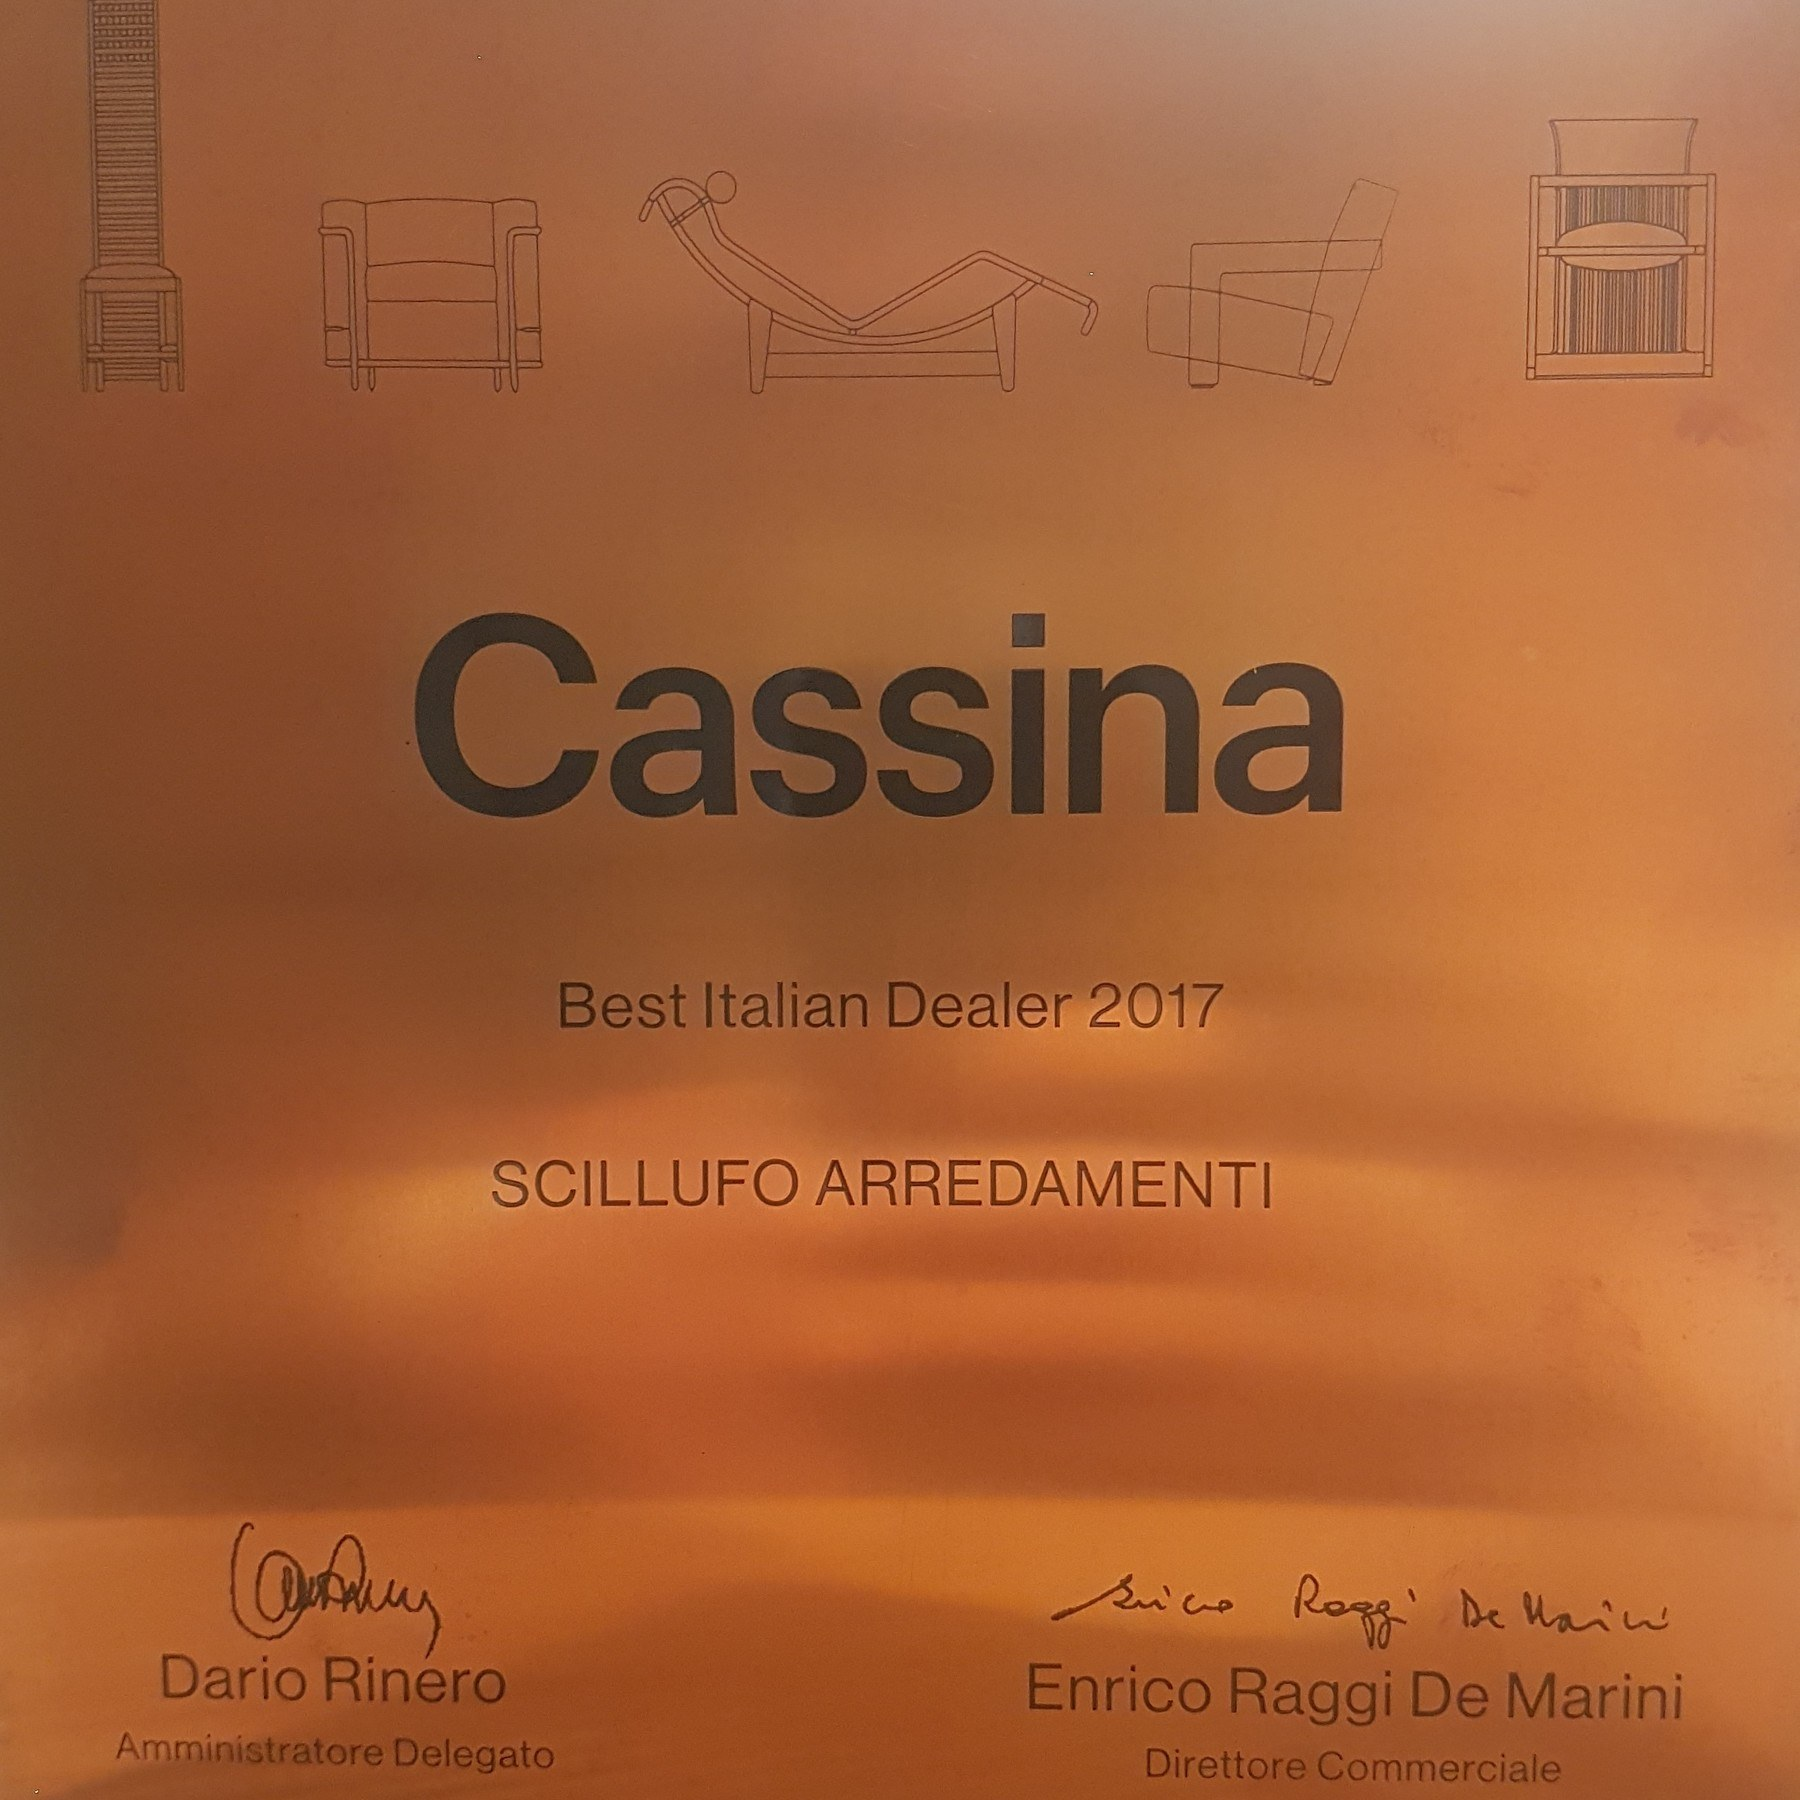 Cassina best italian dealer 2017 scillufo arredamenti for Cassina italy